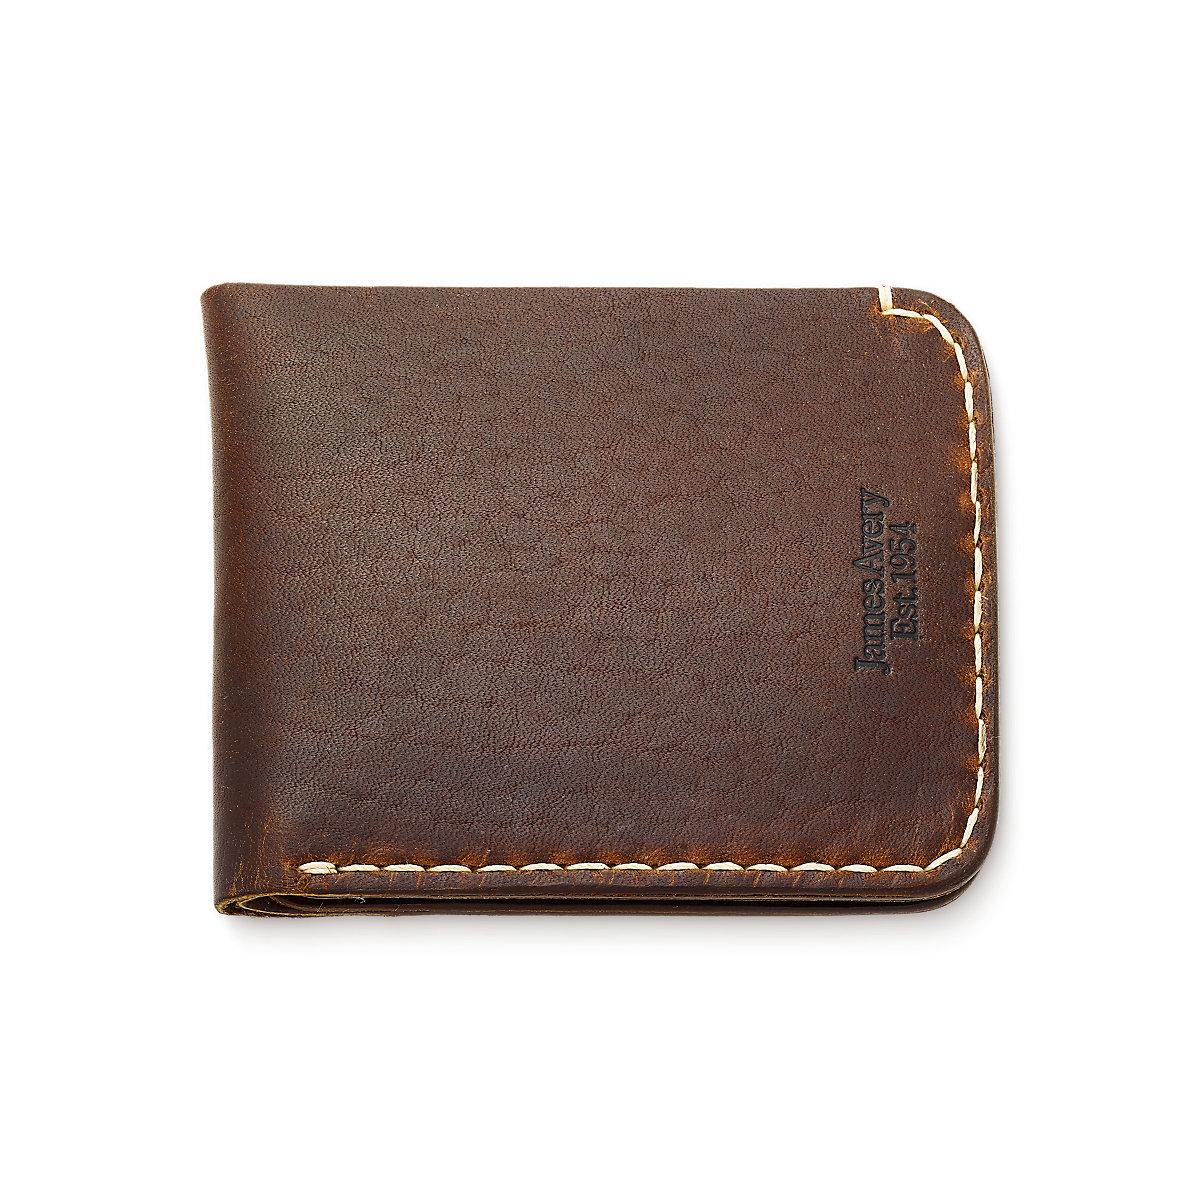 ca3da28d736 Bi-Fold Leather Wallet - James Avery